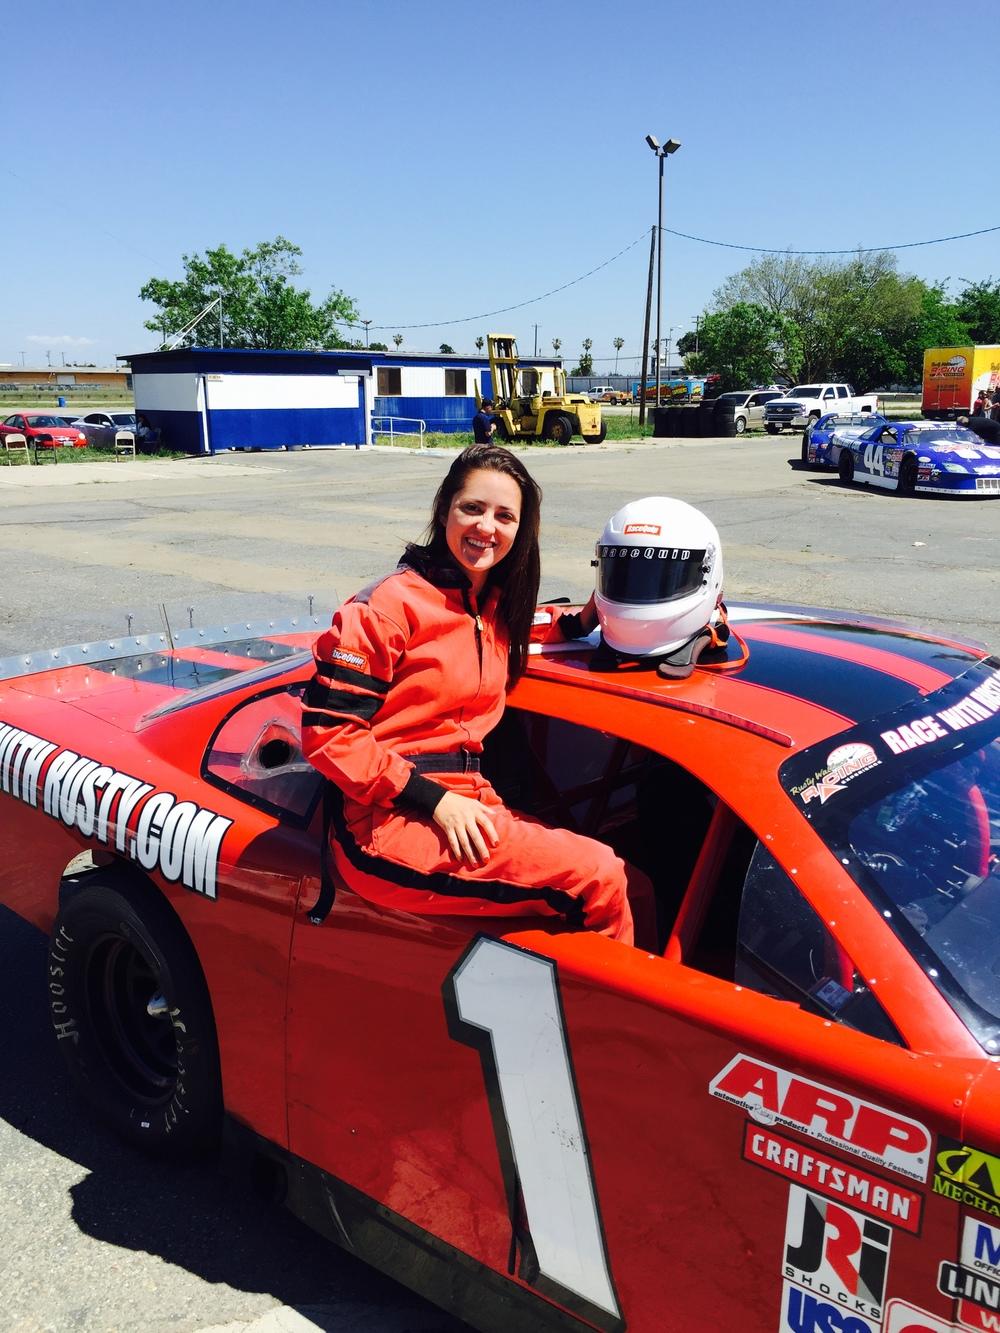 Girls Can Race Cars Too The S A T U R D A Z E